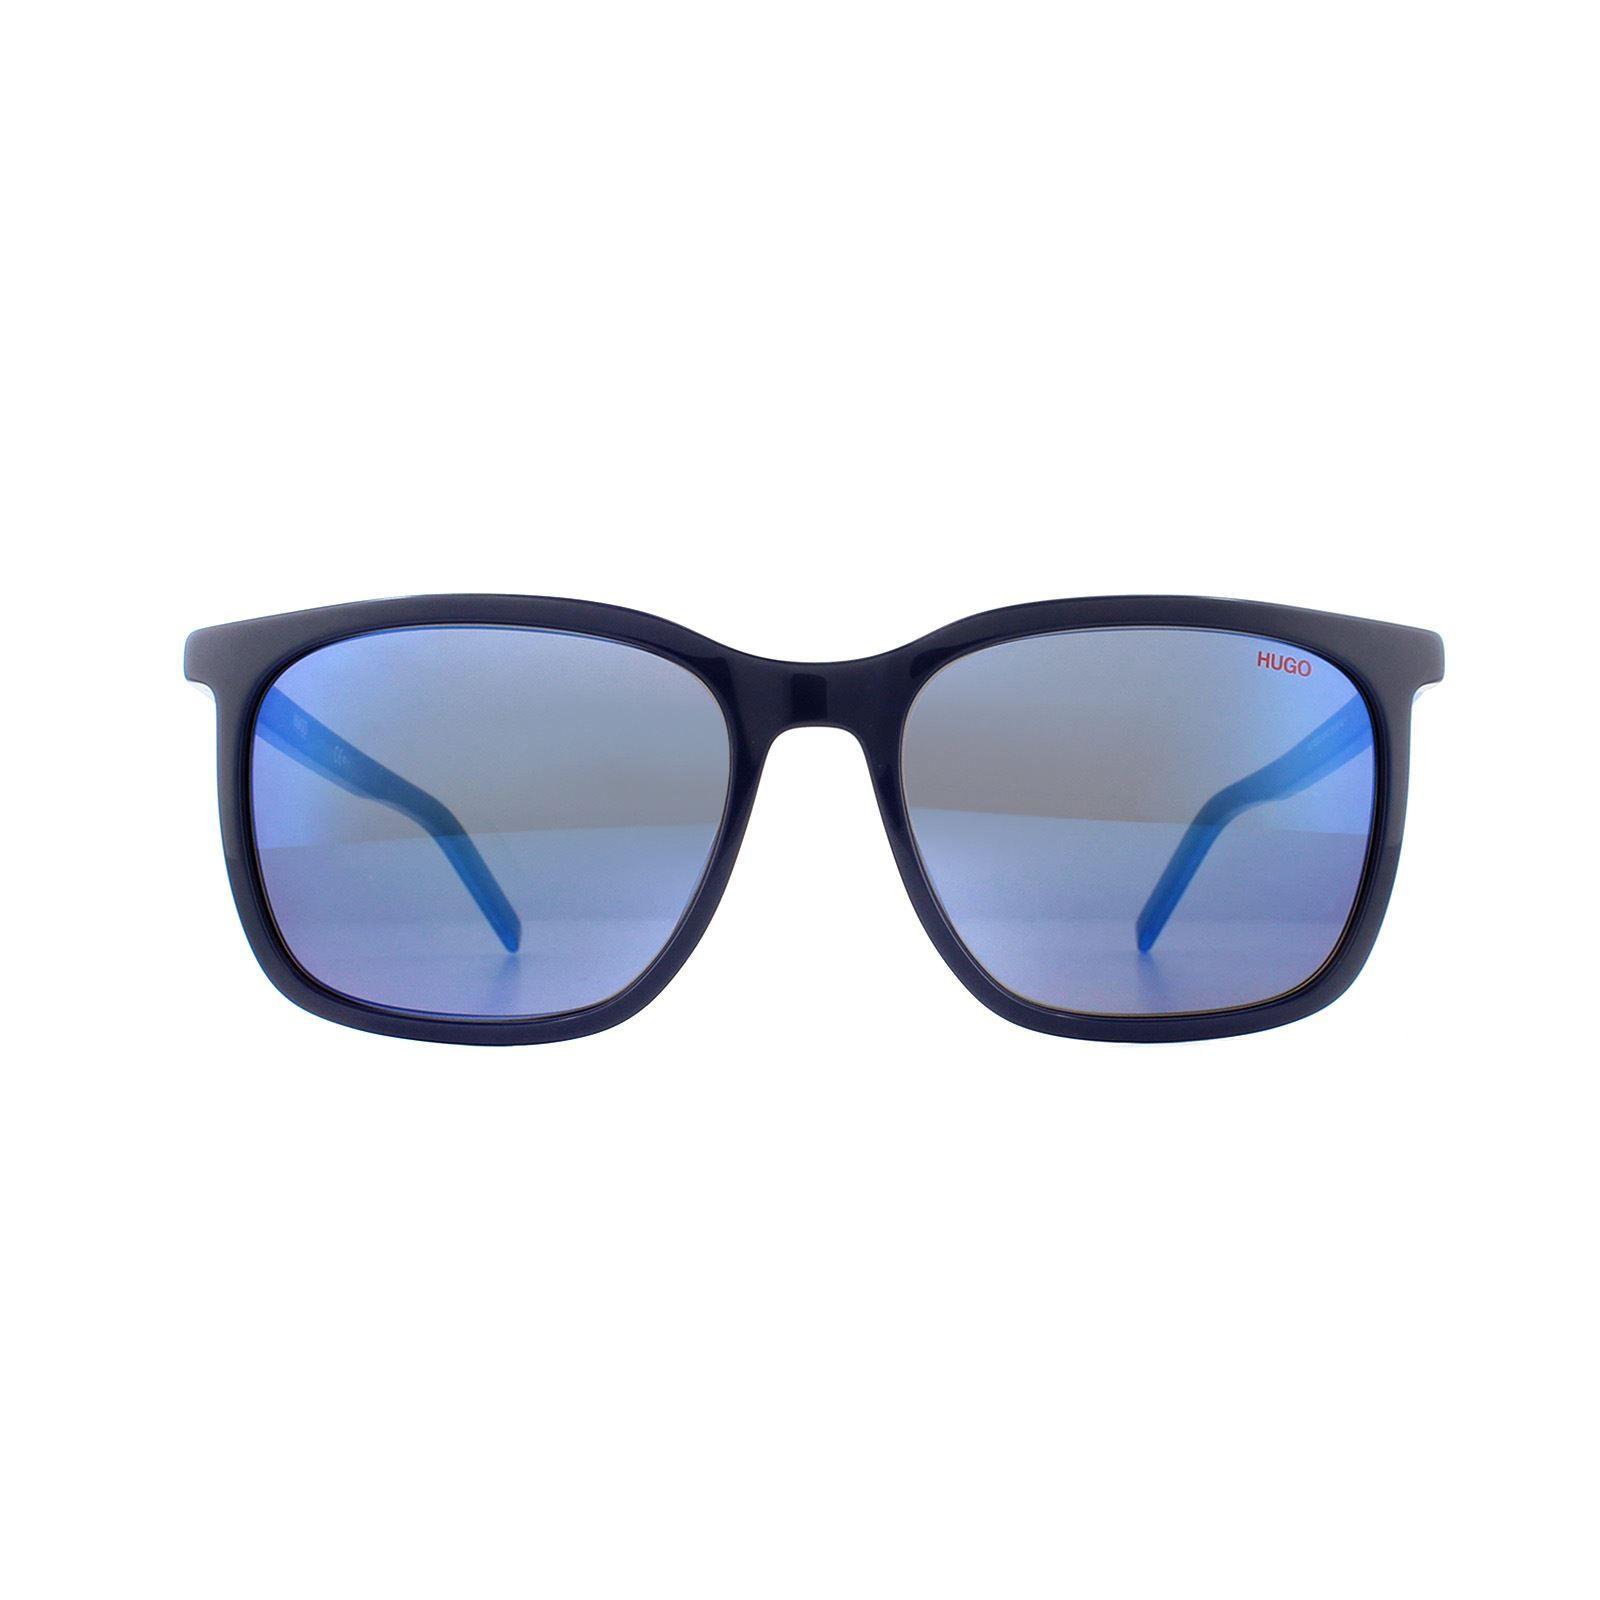 Hugo by Hugo Boss Sunglasses HG 1027/S PJP XT Blue Blue Sky Mirror